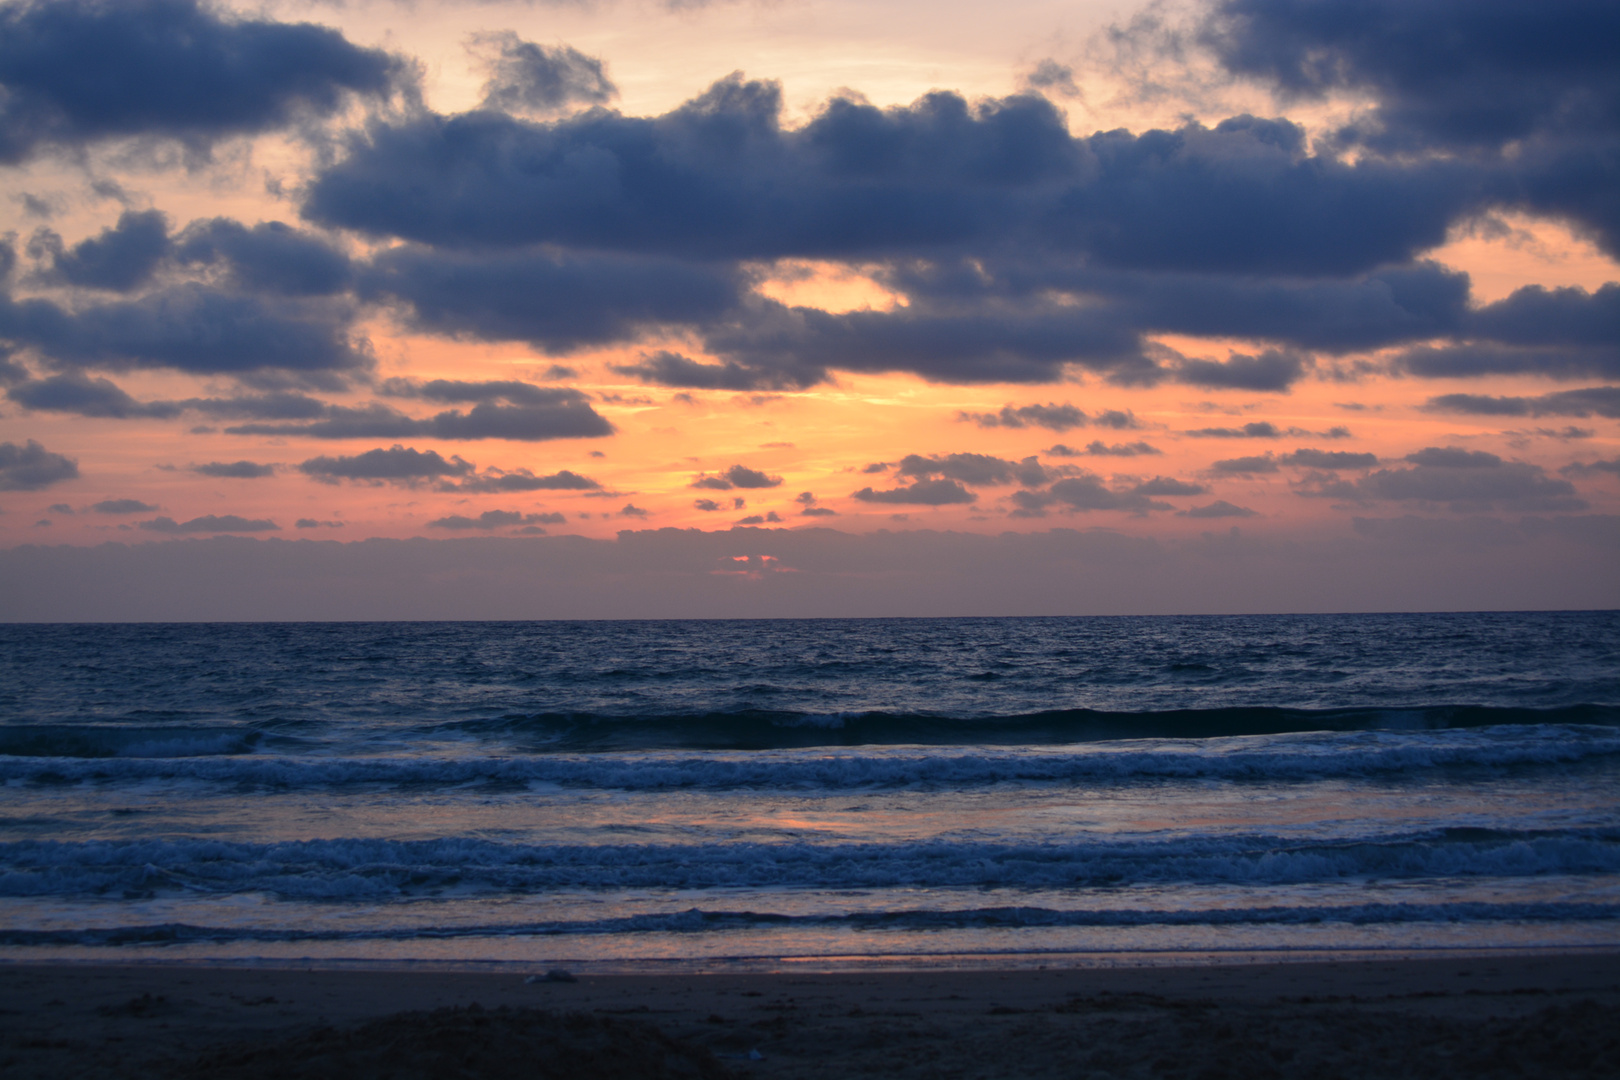 Sonnenuntergang bei Netanya (Israel)